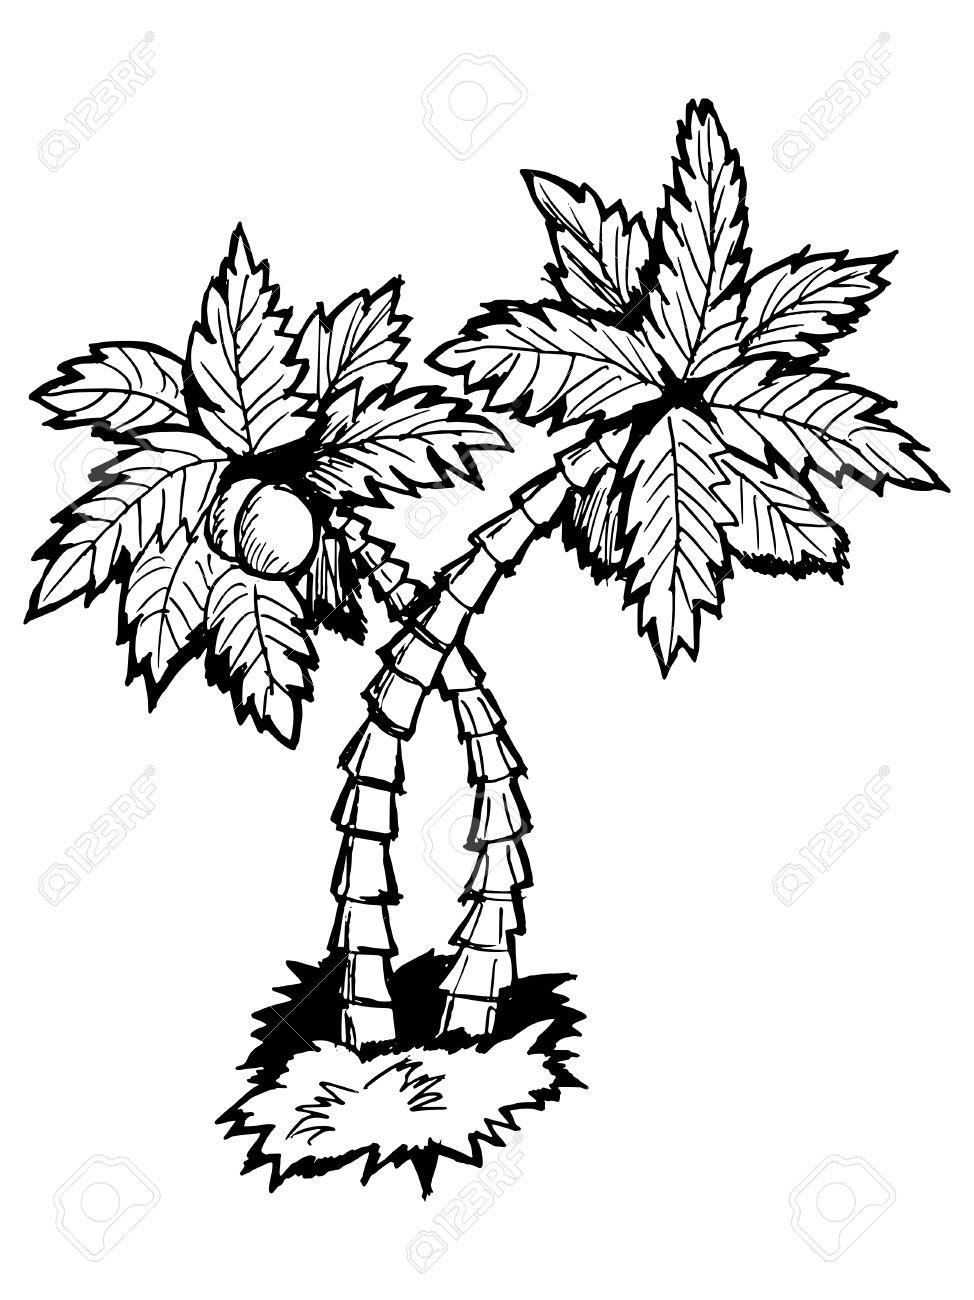 974x1300 Drawn Hand Palm Tree